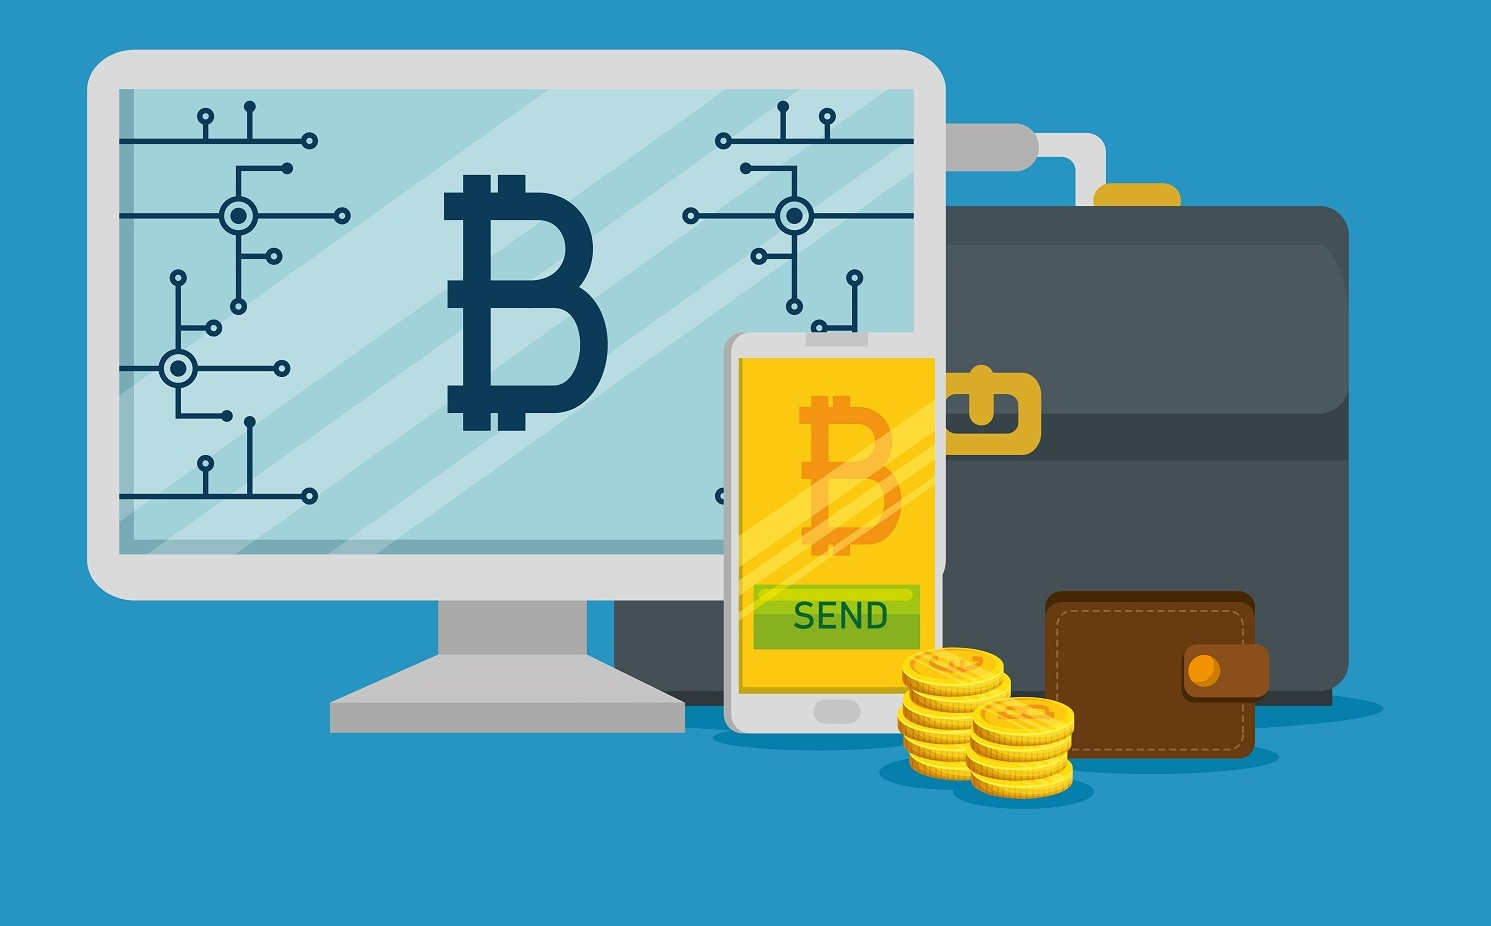 pirkti bitcoin su kredito kortele nr id